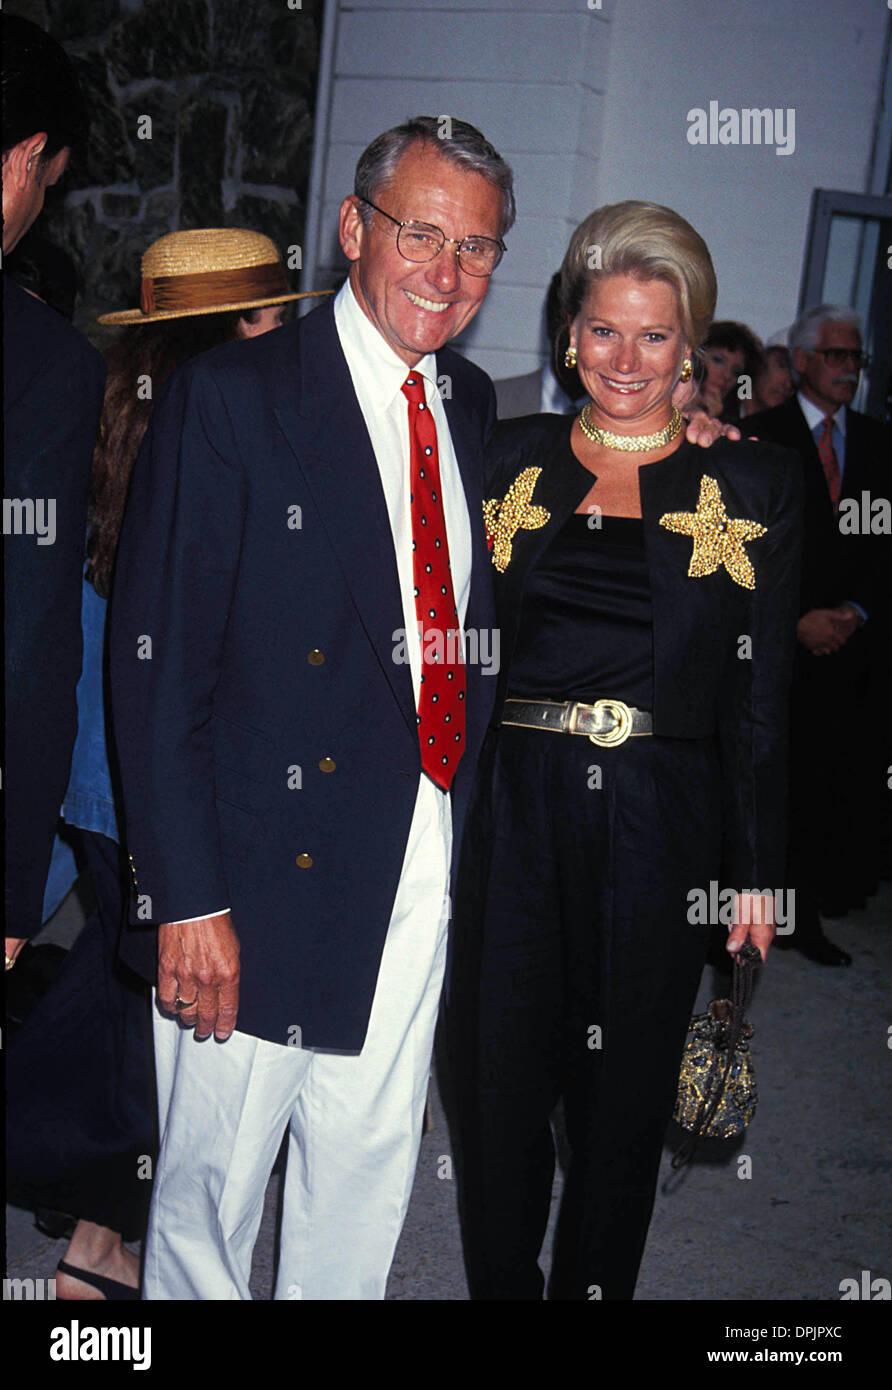 Mar. 20, 2006 - BILL BUETEL 08-14-1993.L6222ST. STEPHEN TRUPP-(Credit Image: © Globe Photos/ZUMAPRESS.com) - Stock Image